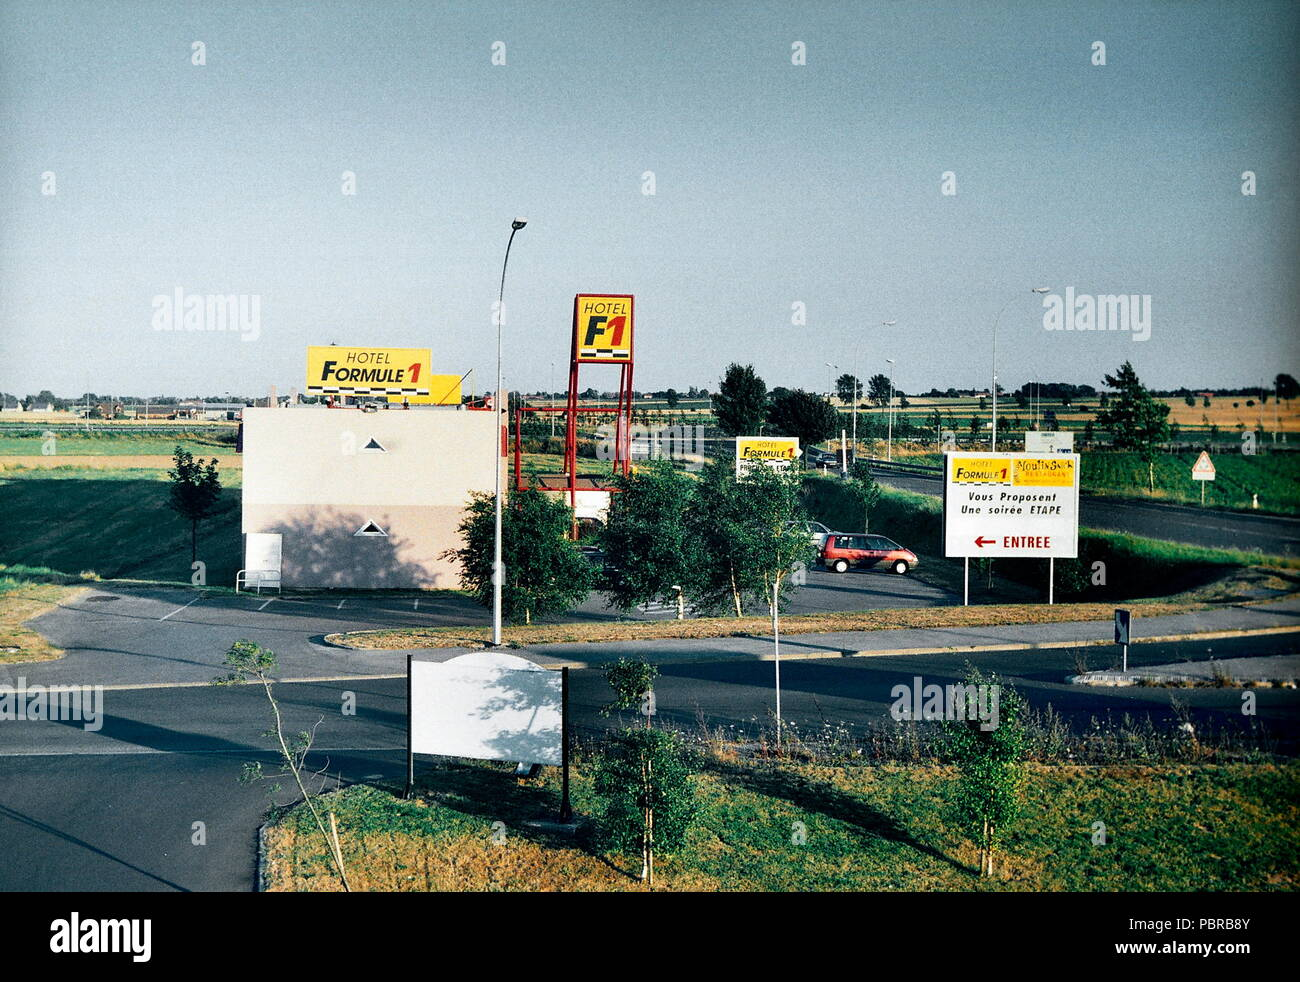 AJAXNETPHOTO. CAMBRAI, FRANCE - HOTEL FORMULE 1 - LANDSCAPE NR CAMBRAI. PHOTO:JONATHAN EASTLAND/AJAX REF:TC_6045_36_21A - Stock Image